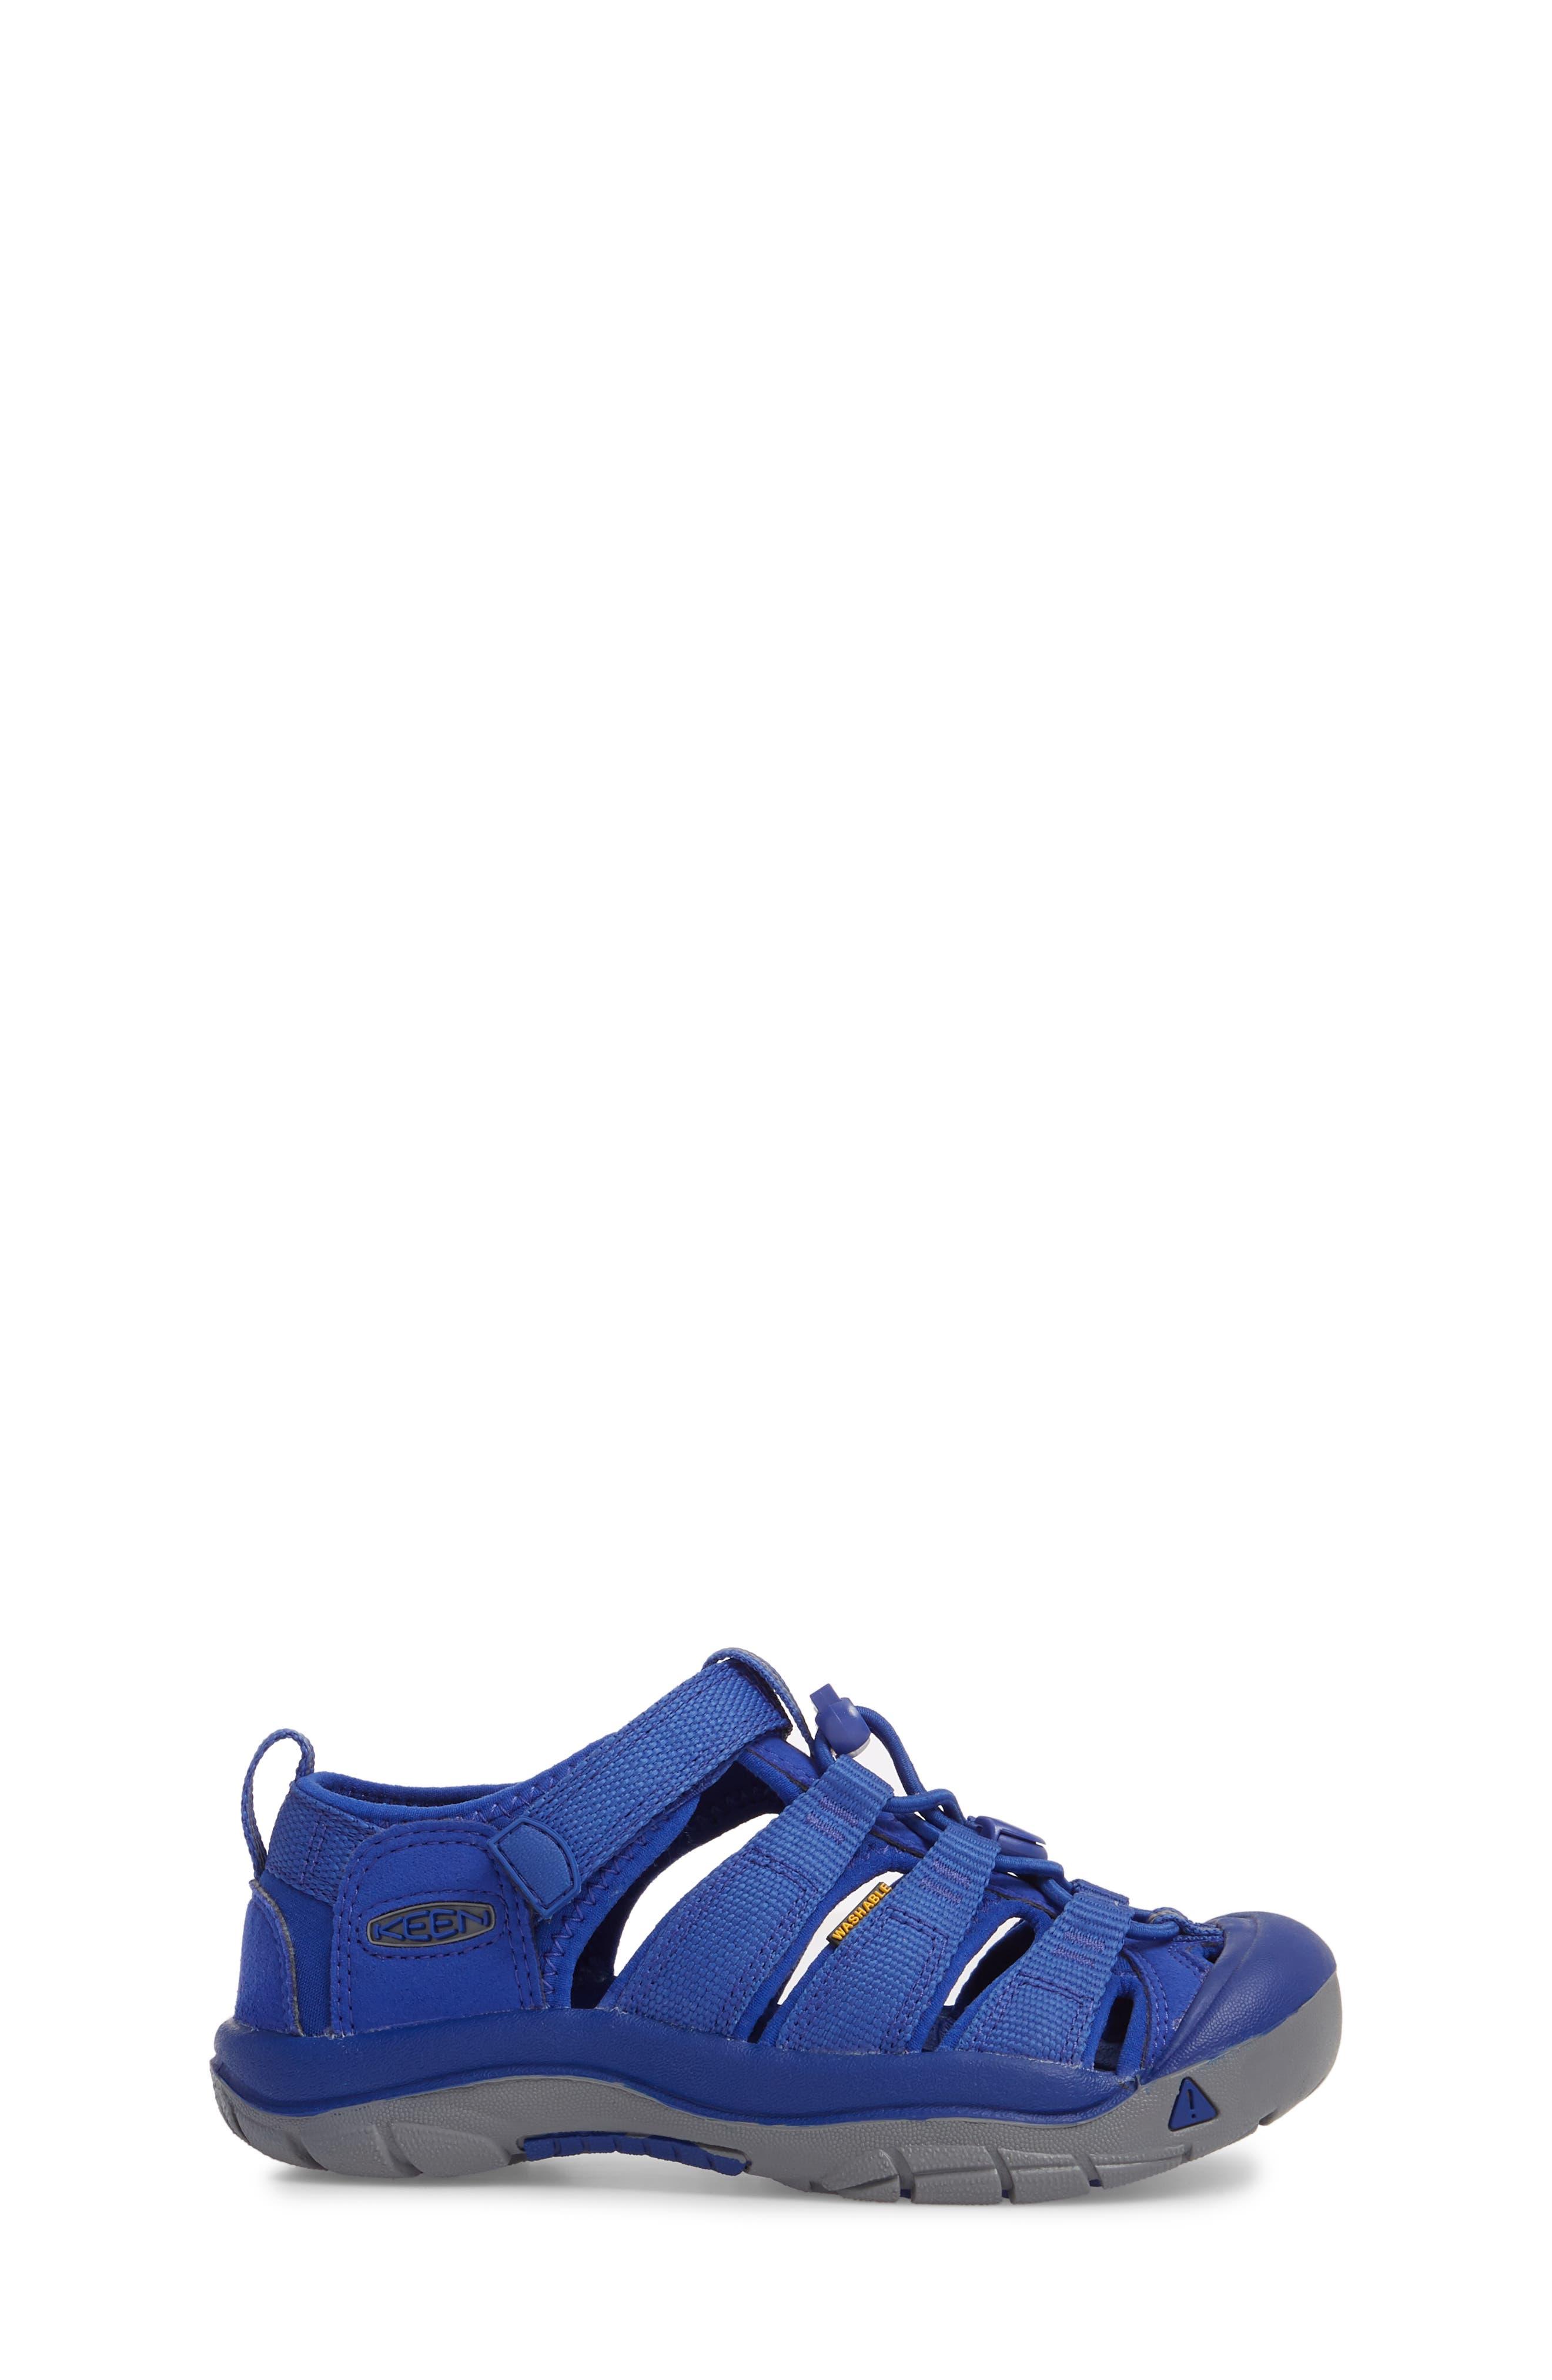 'Newport H2' Water Friendly Sandal,                             Alternate thumbnail 116, color,